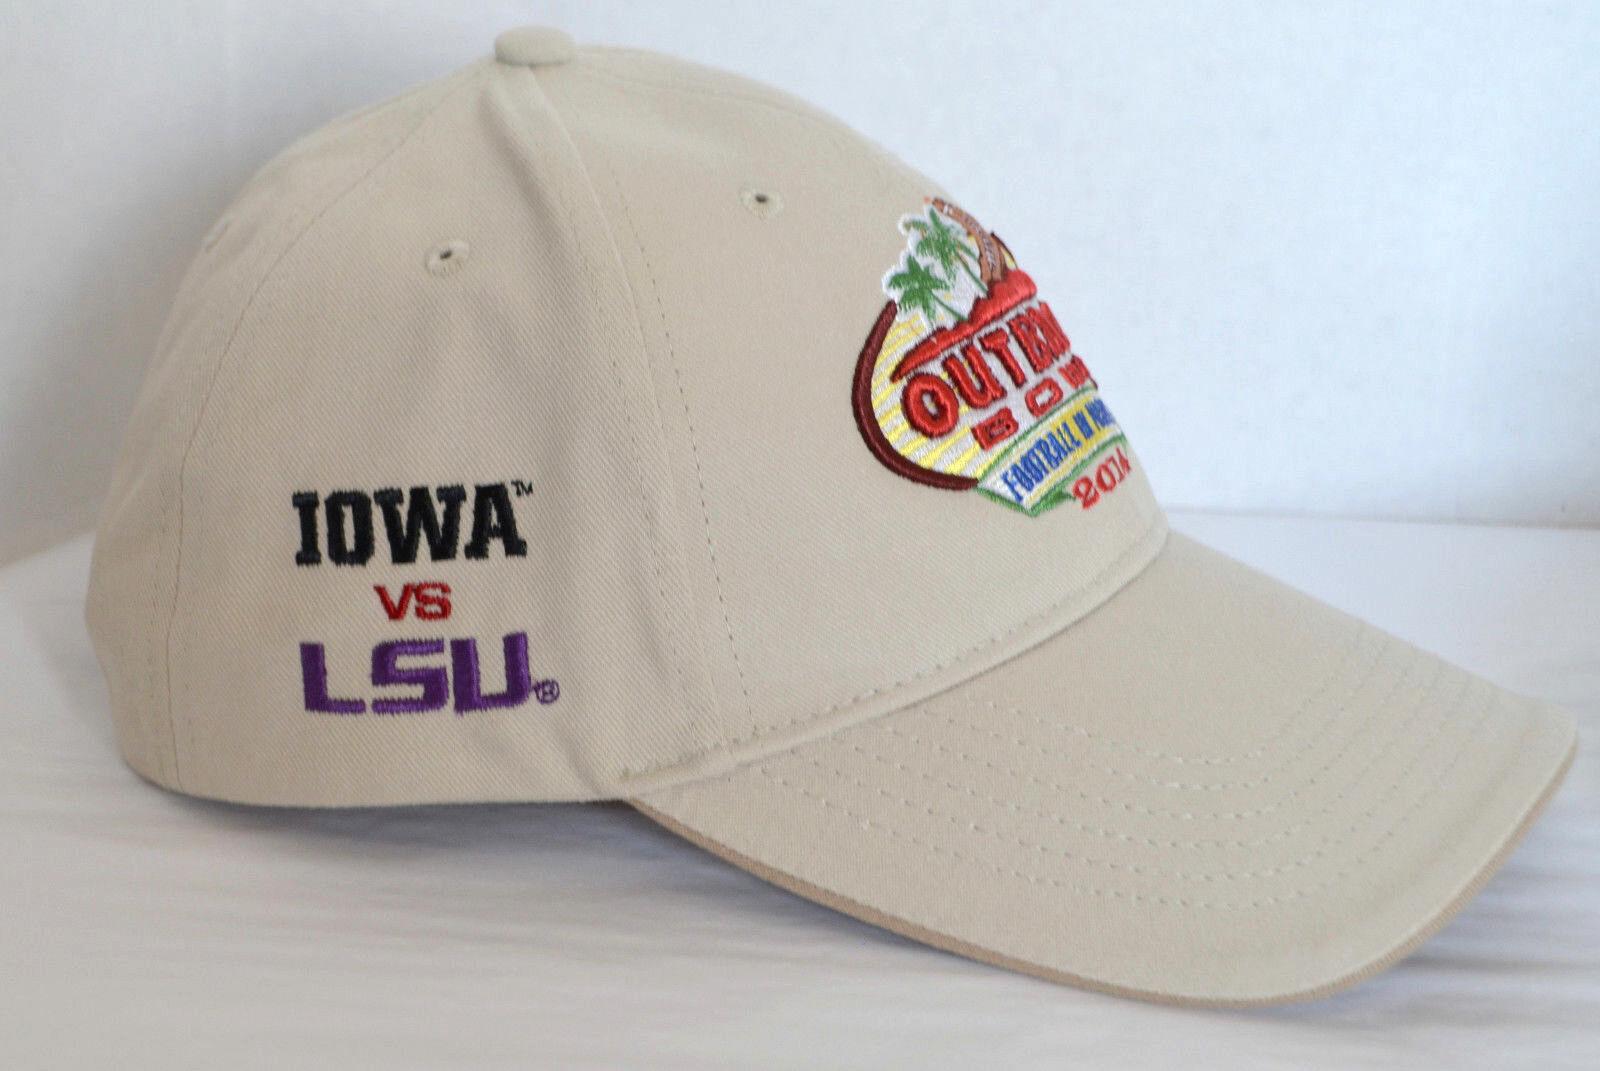 New Outback VS Bowl 2014 Hat Iowa VS Outback LSU Baseball Ball Cap Lid Football Sports Adj b4a9a4